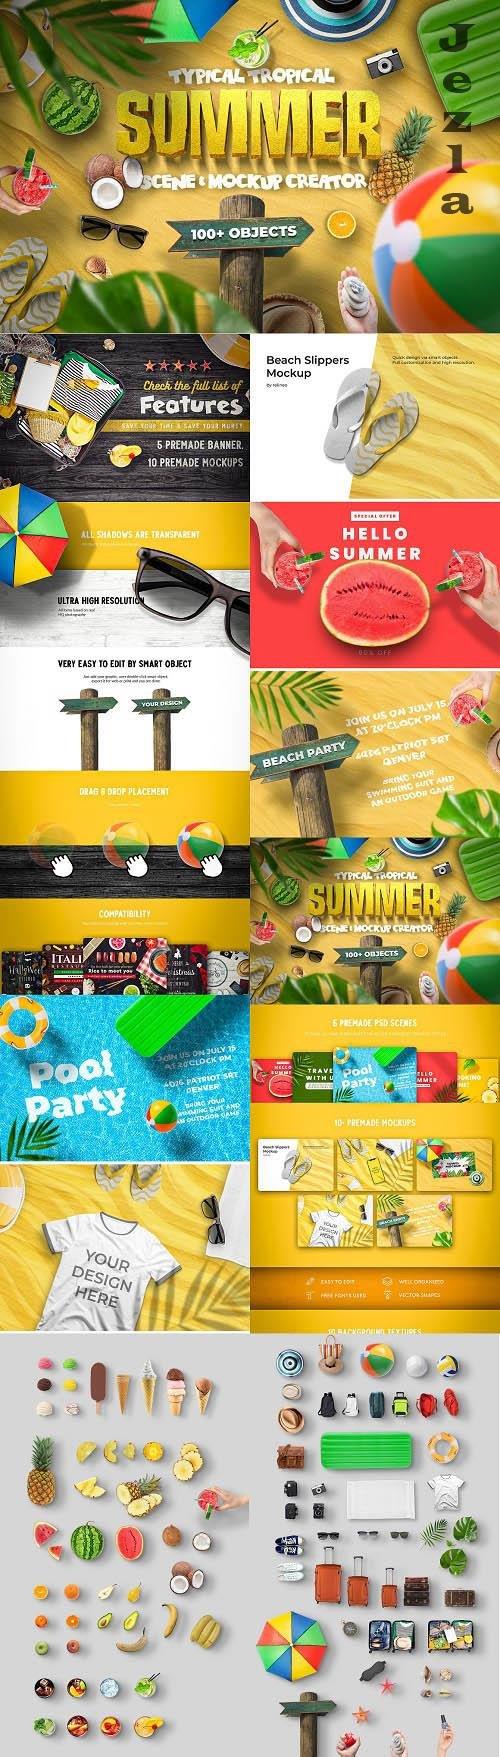 Summer Scene and Mockup Creator - 6417911